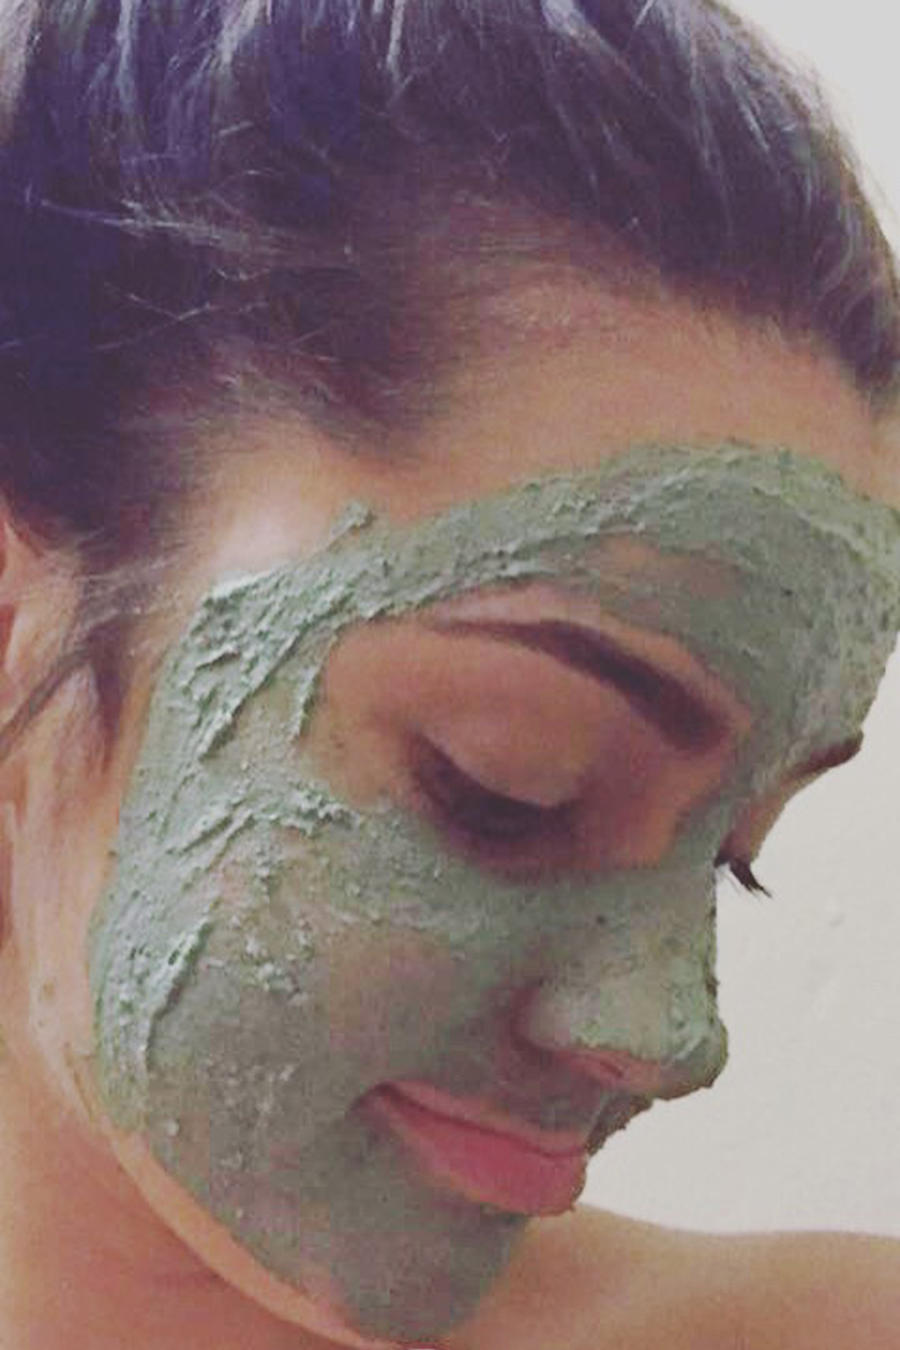 Chica con mascarilla facial